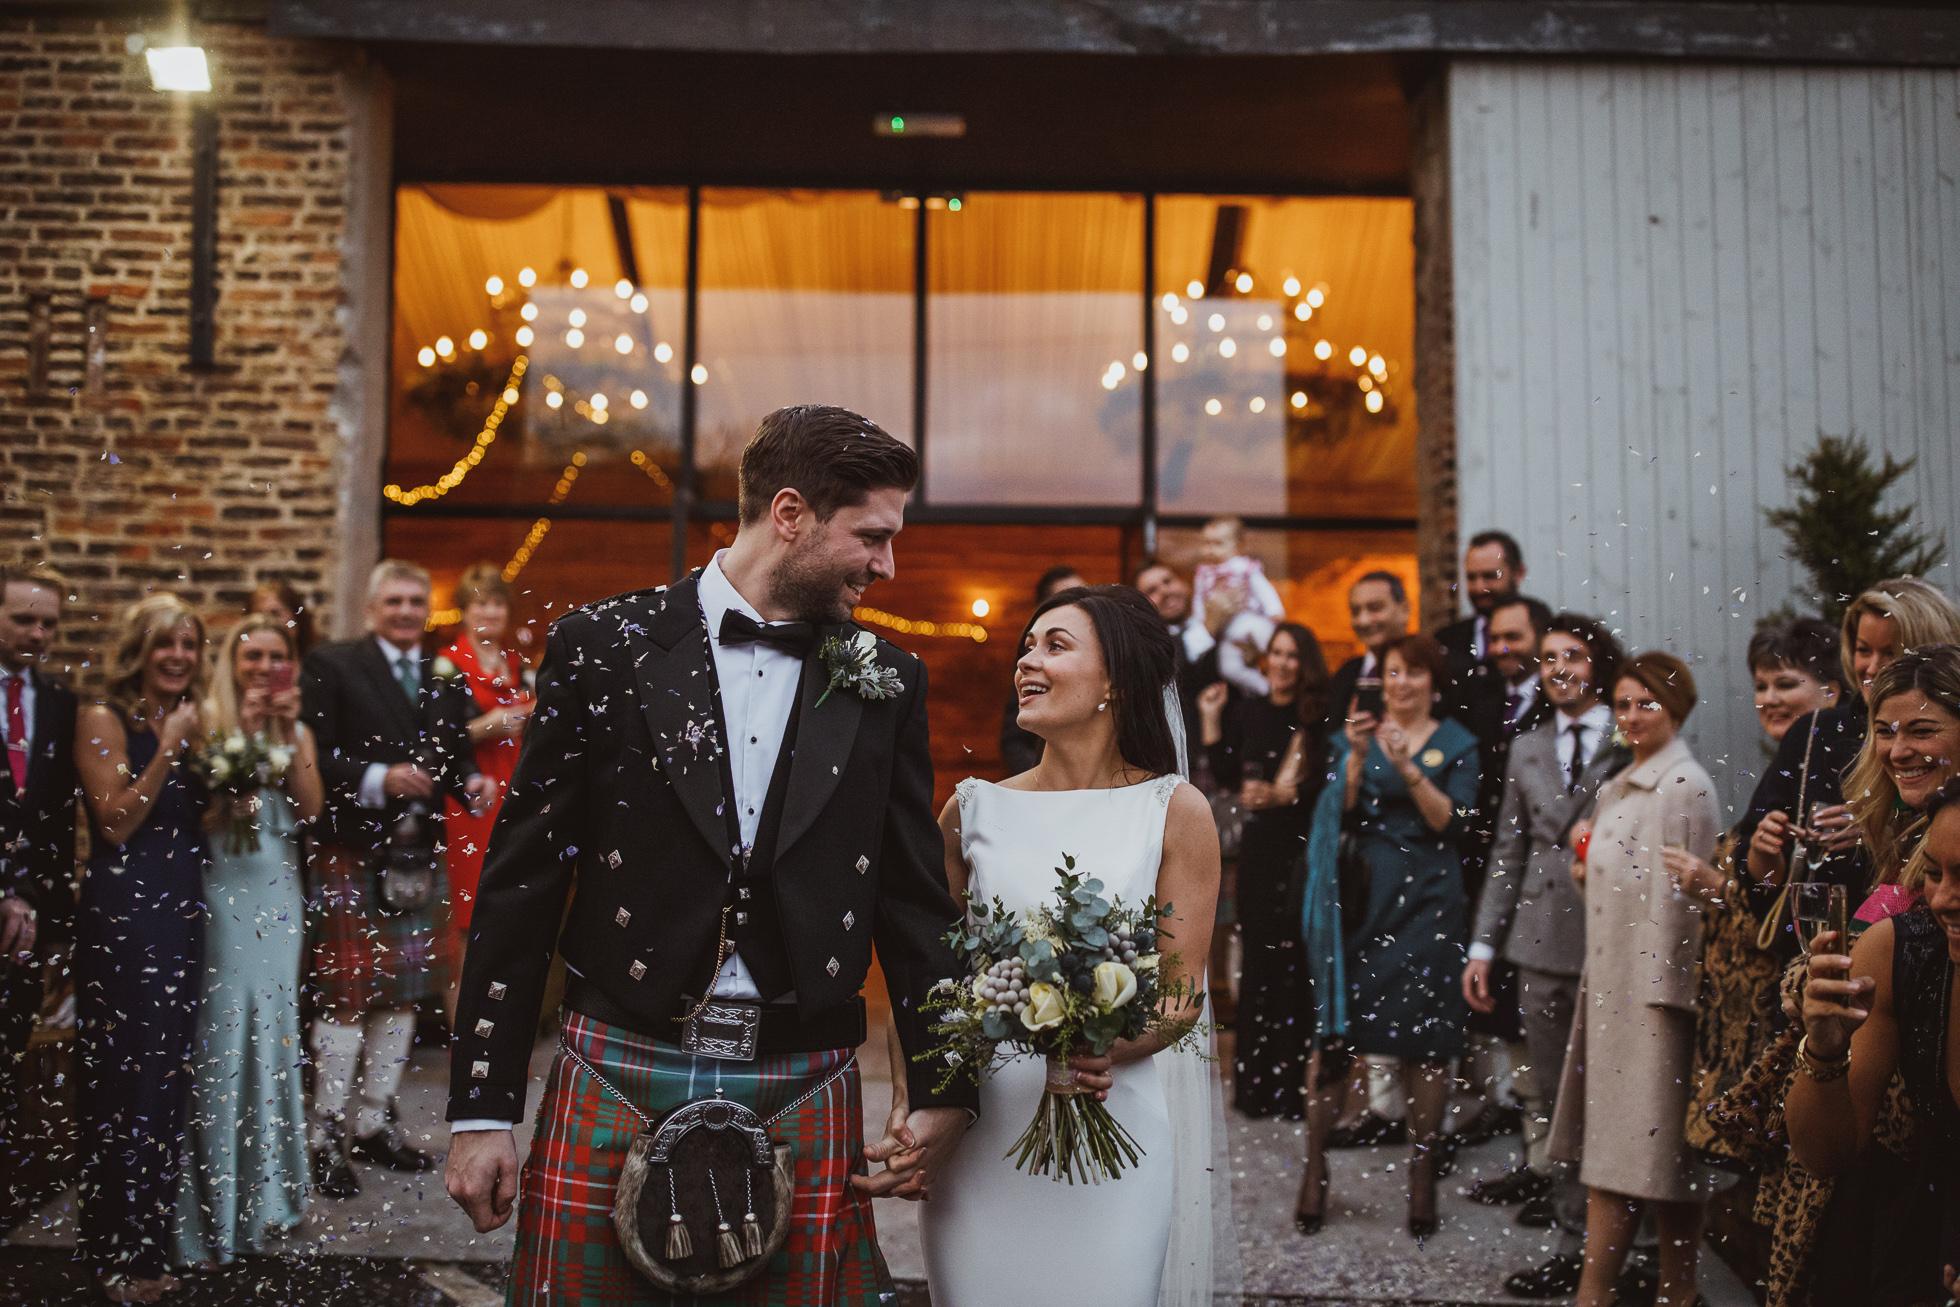 hornington_manor_wedding_photographer-63.jpg